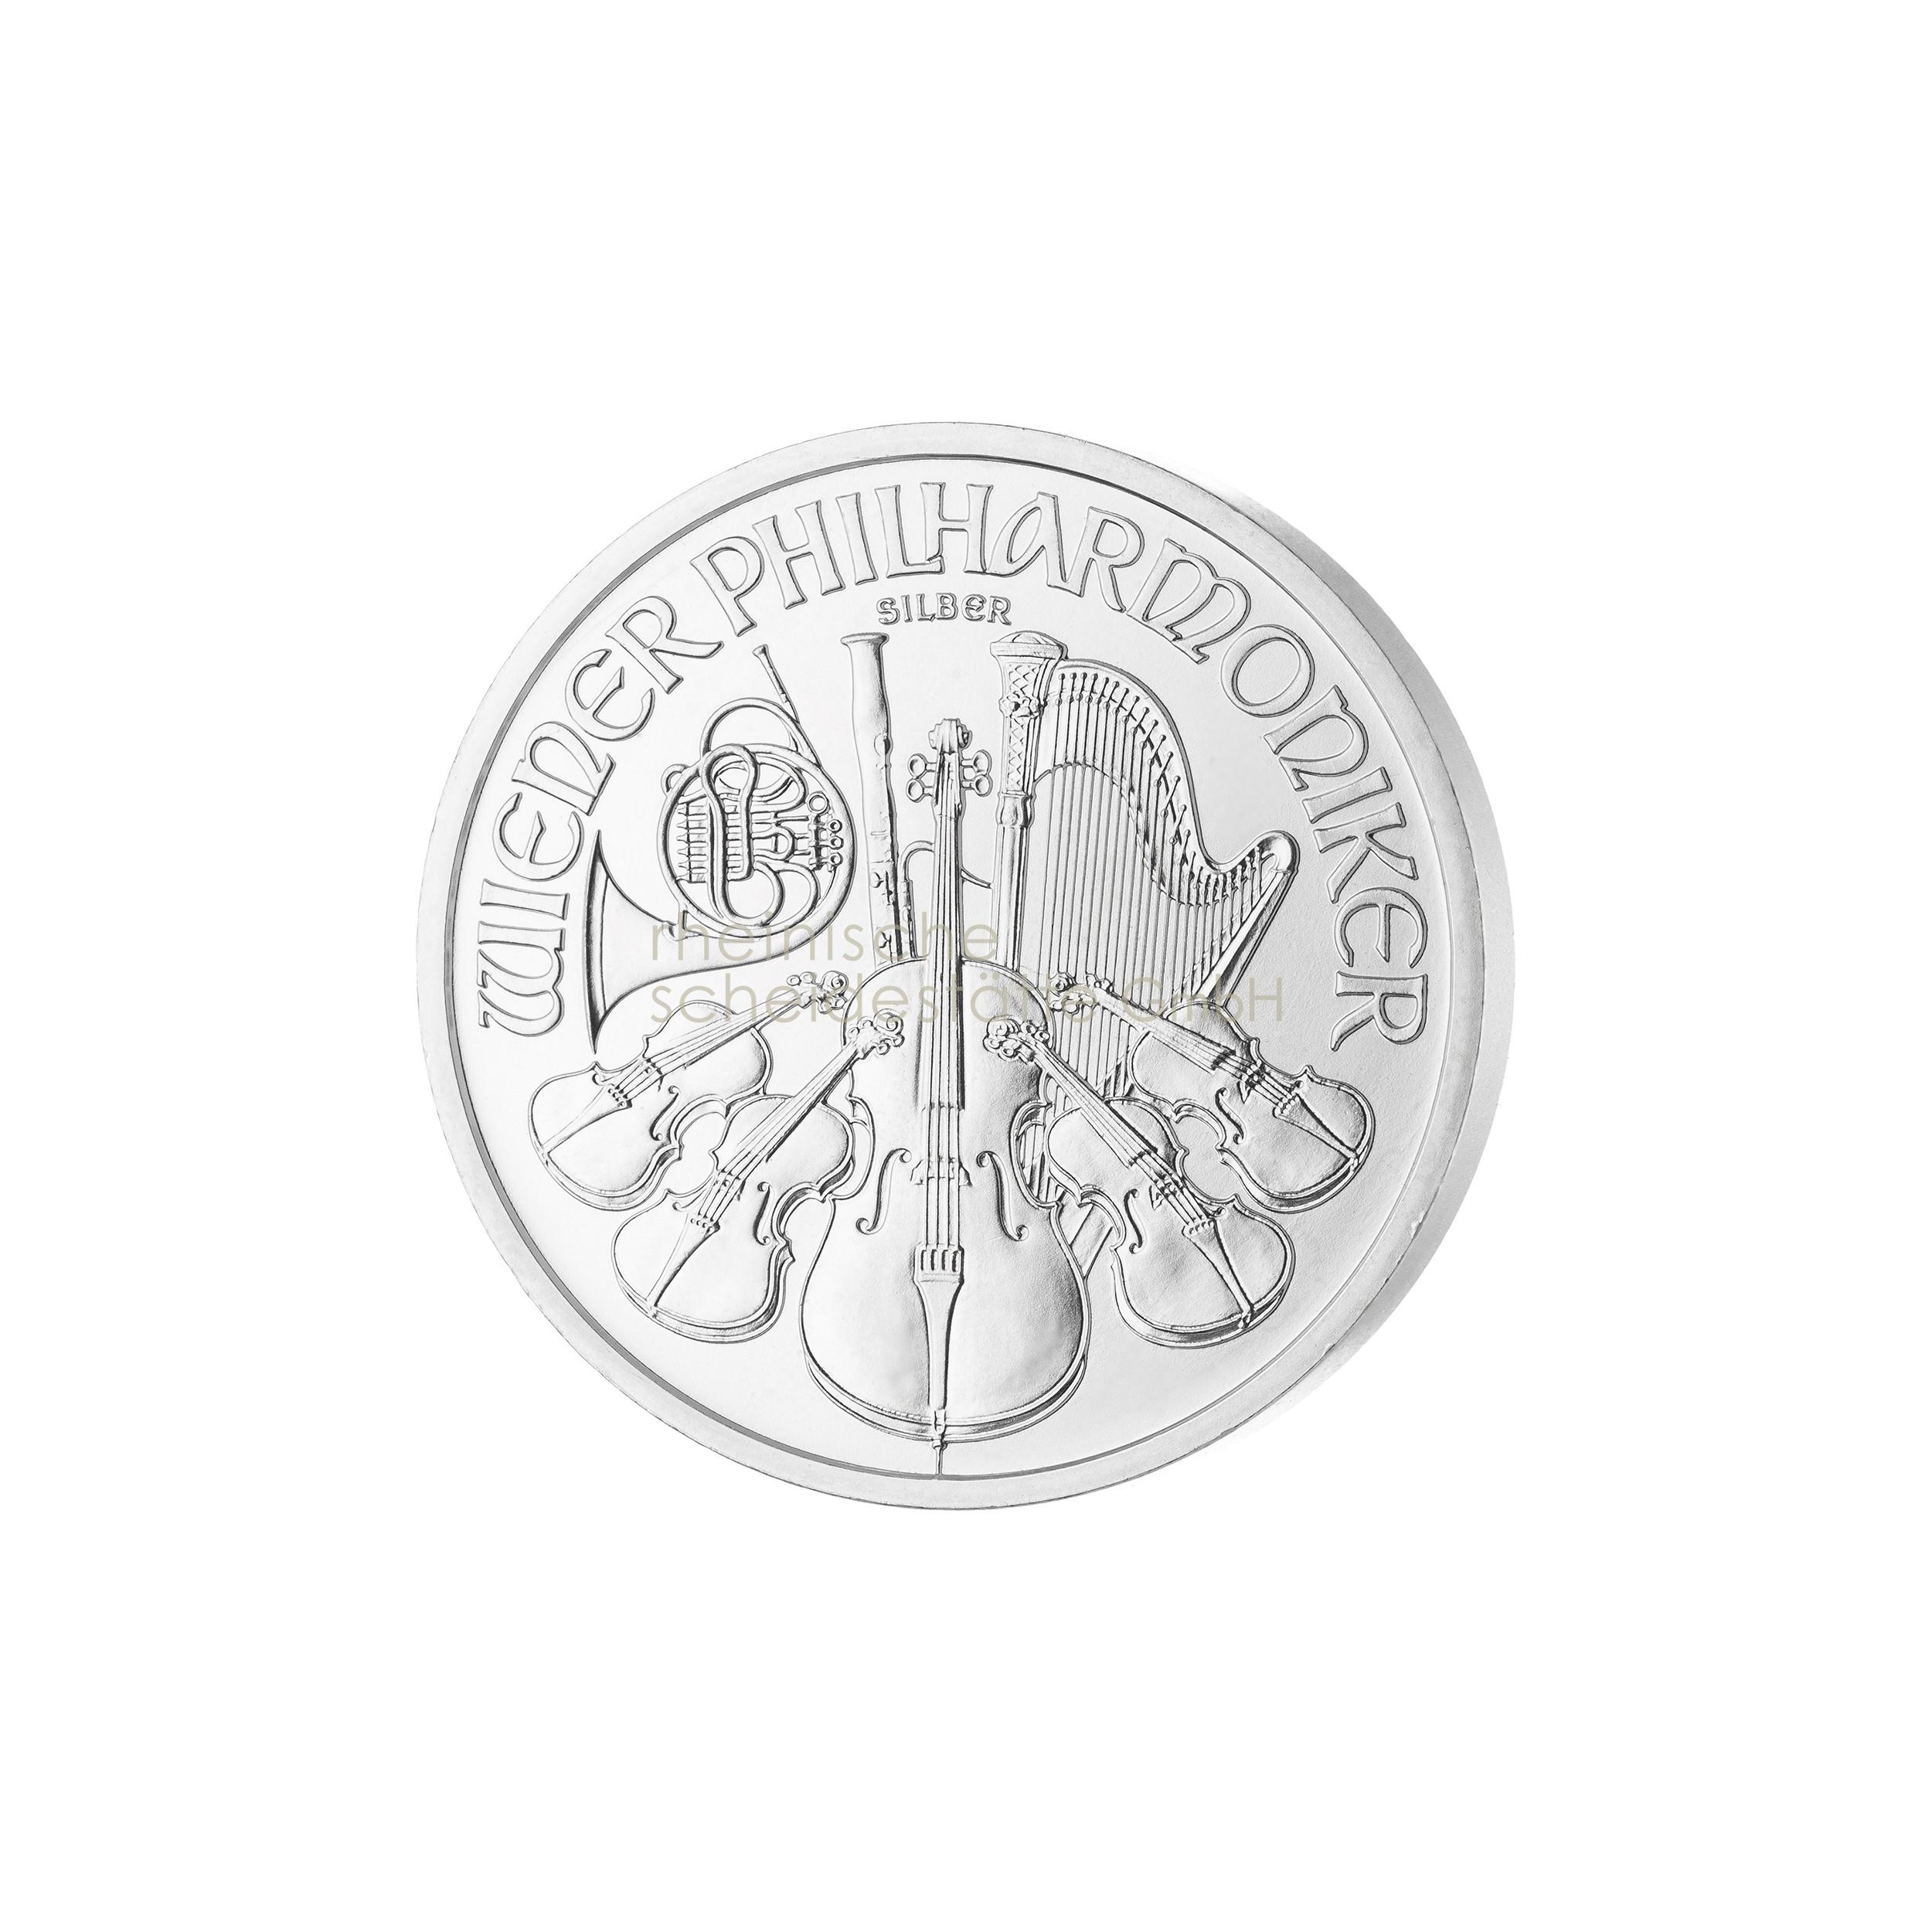 1 Unze Wiener Philharmoniker Silbermünze b